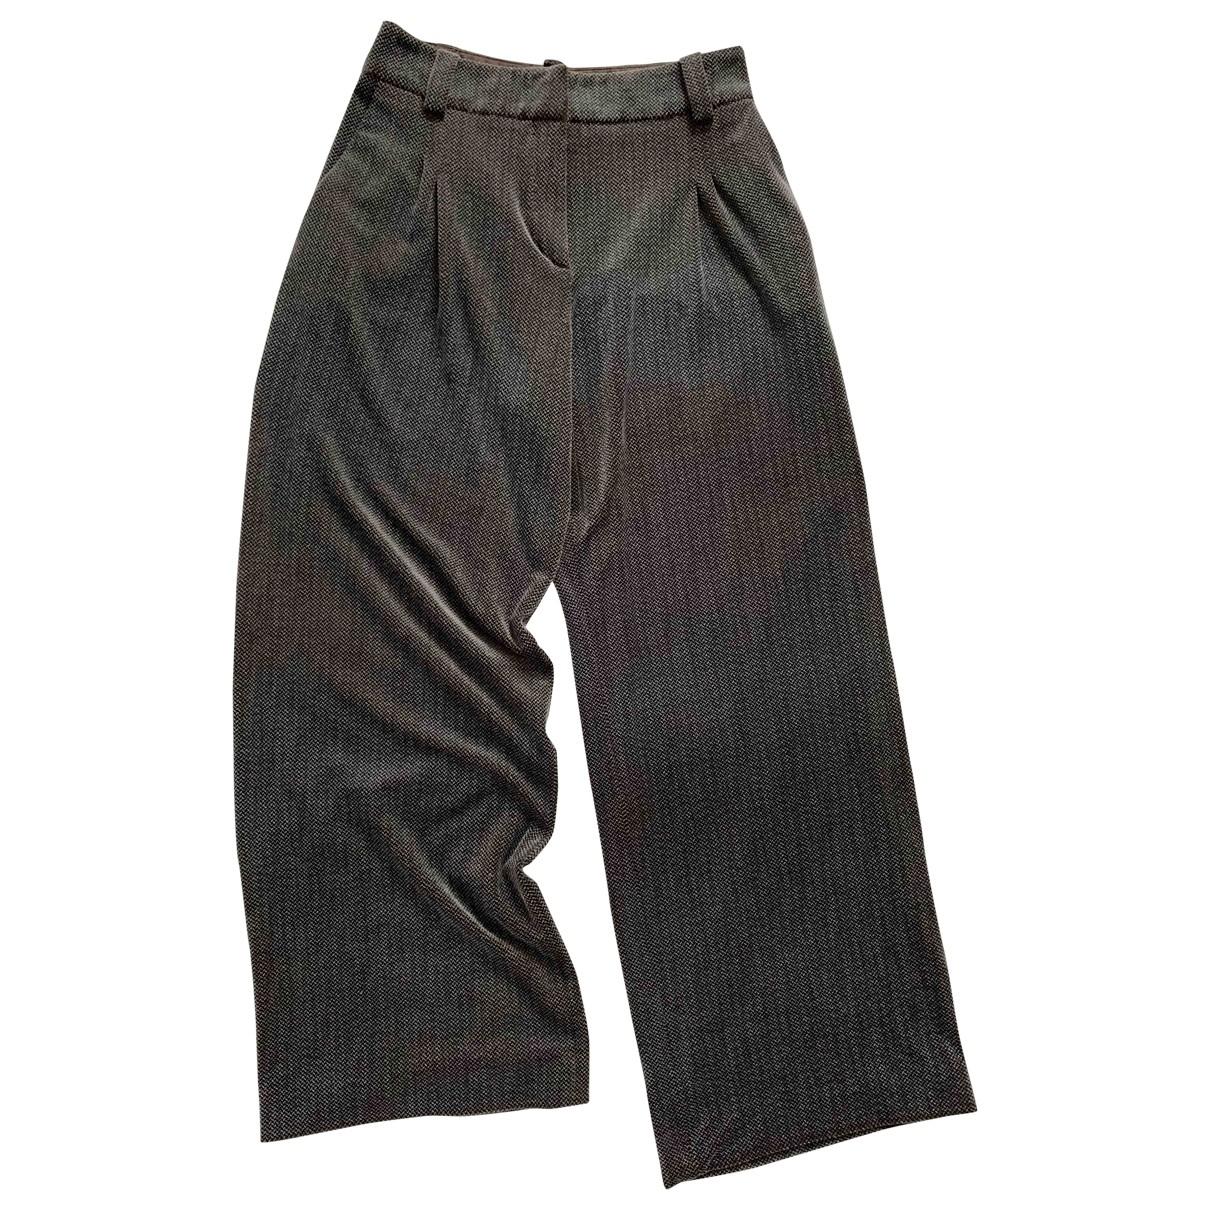 Giorgio Armani \N Brown Trousers for Women 44 IT